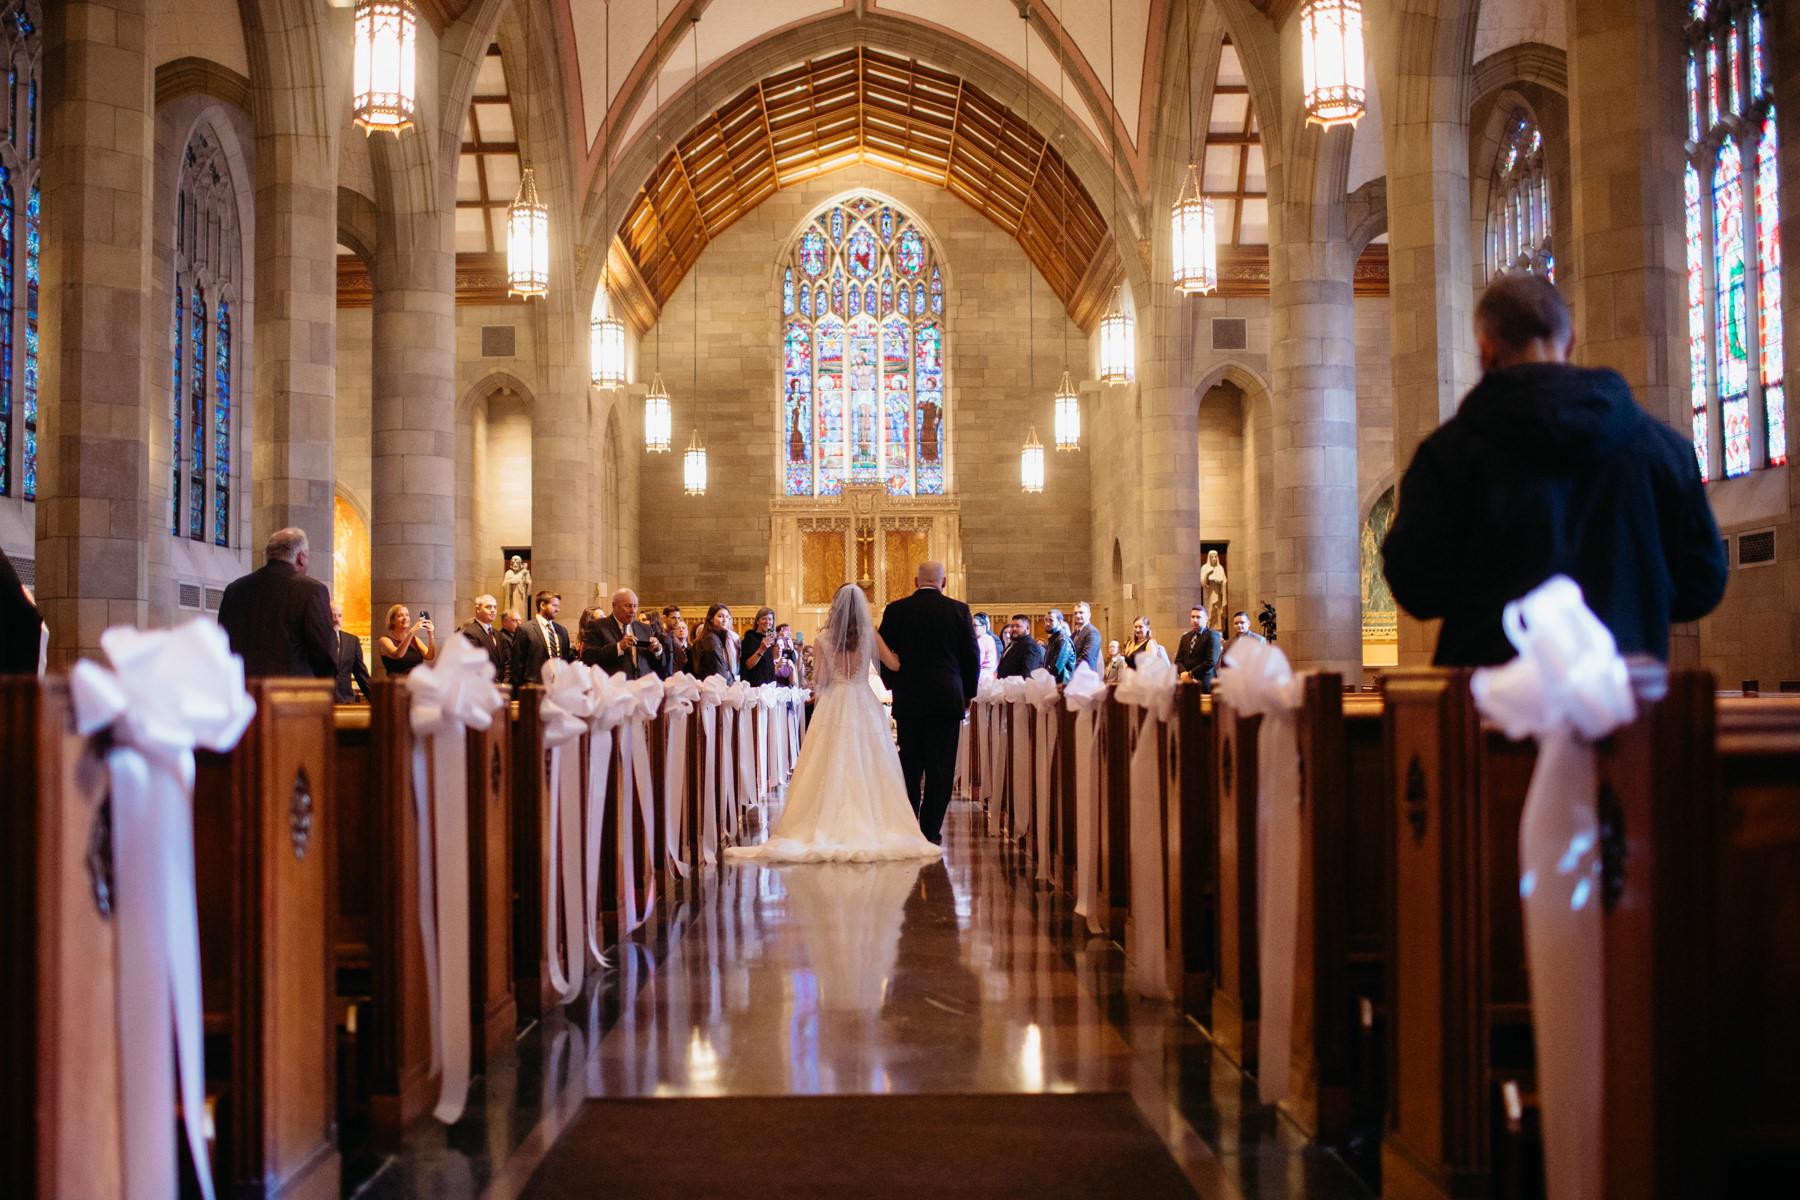 Quincy Ma Massachusetts Wedding Dedham Boston Granie Links Wedding New England Catholic Cathedral Liz Osban Photography 36.jpg